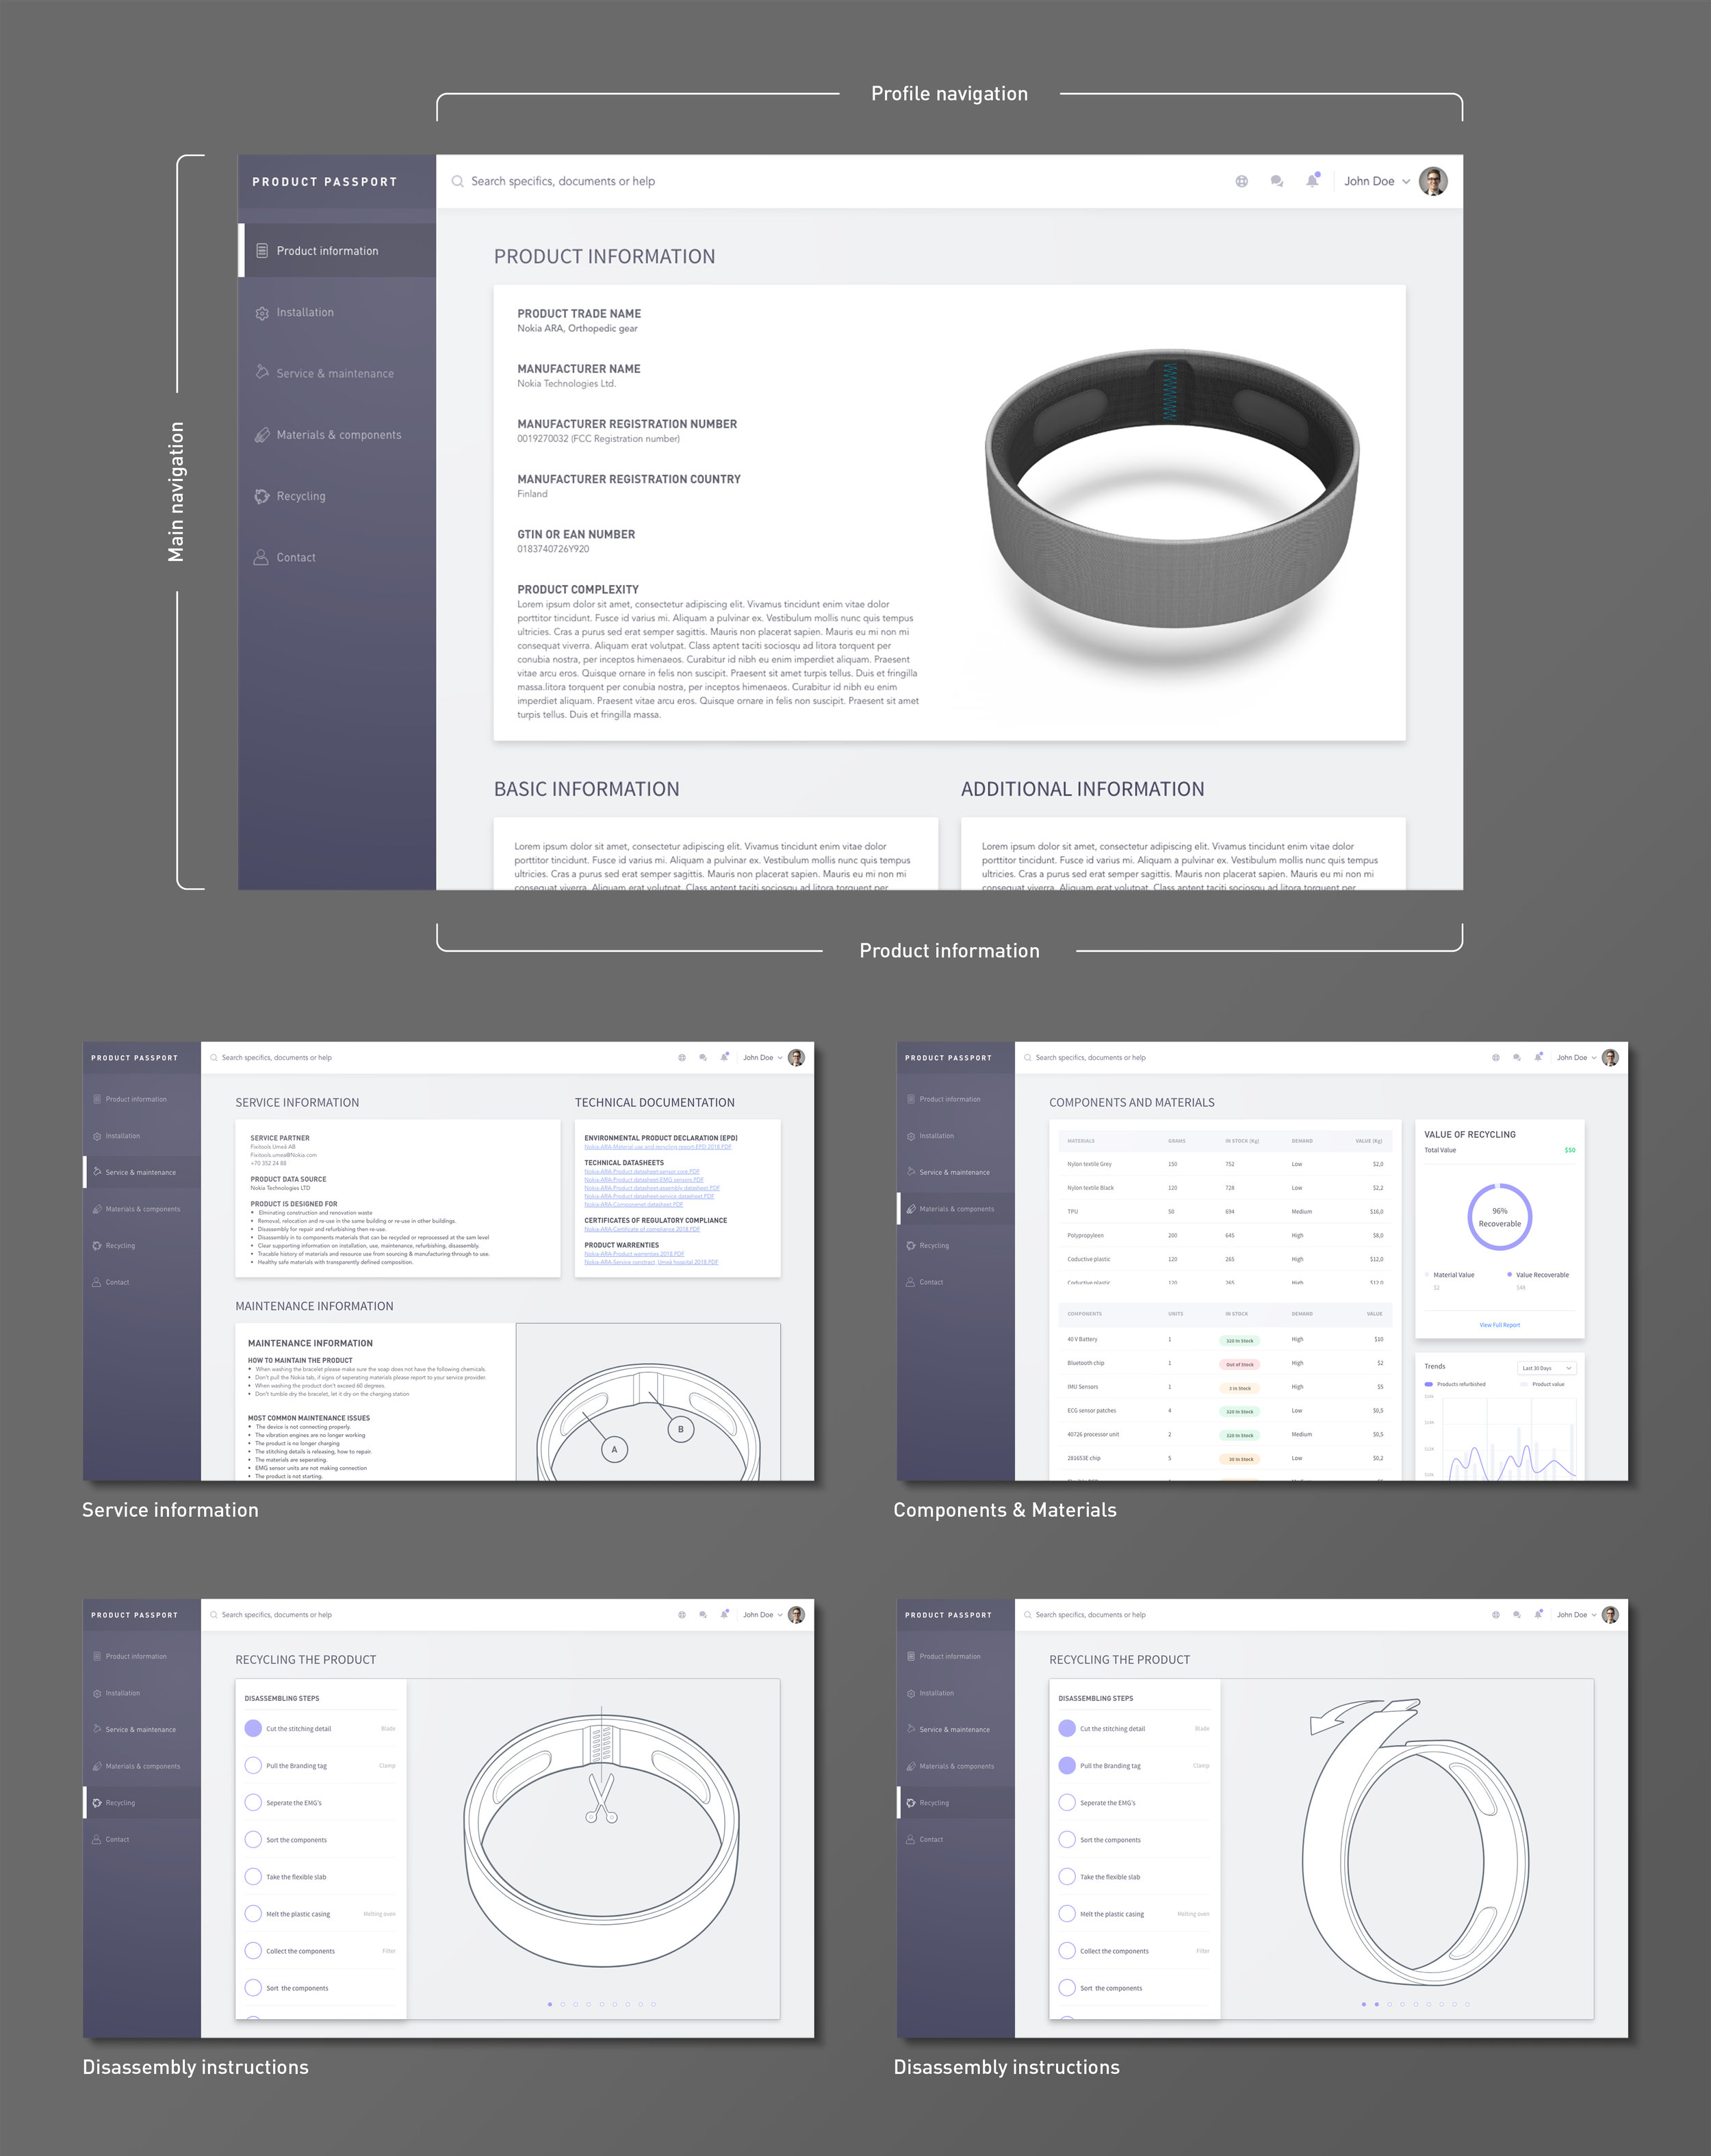 180523_Product passport_screens_002R.jpg